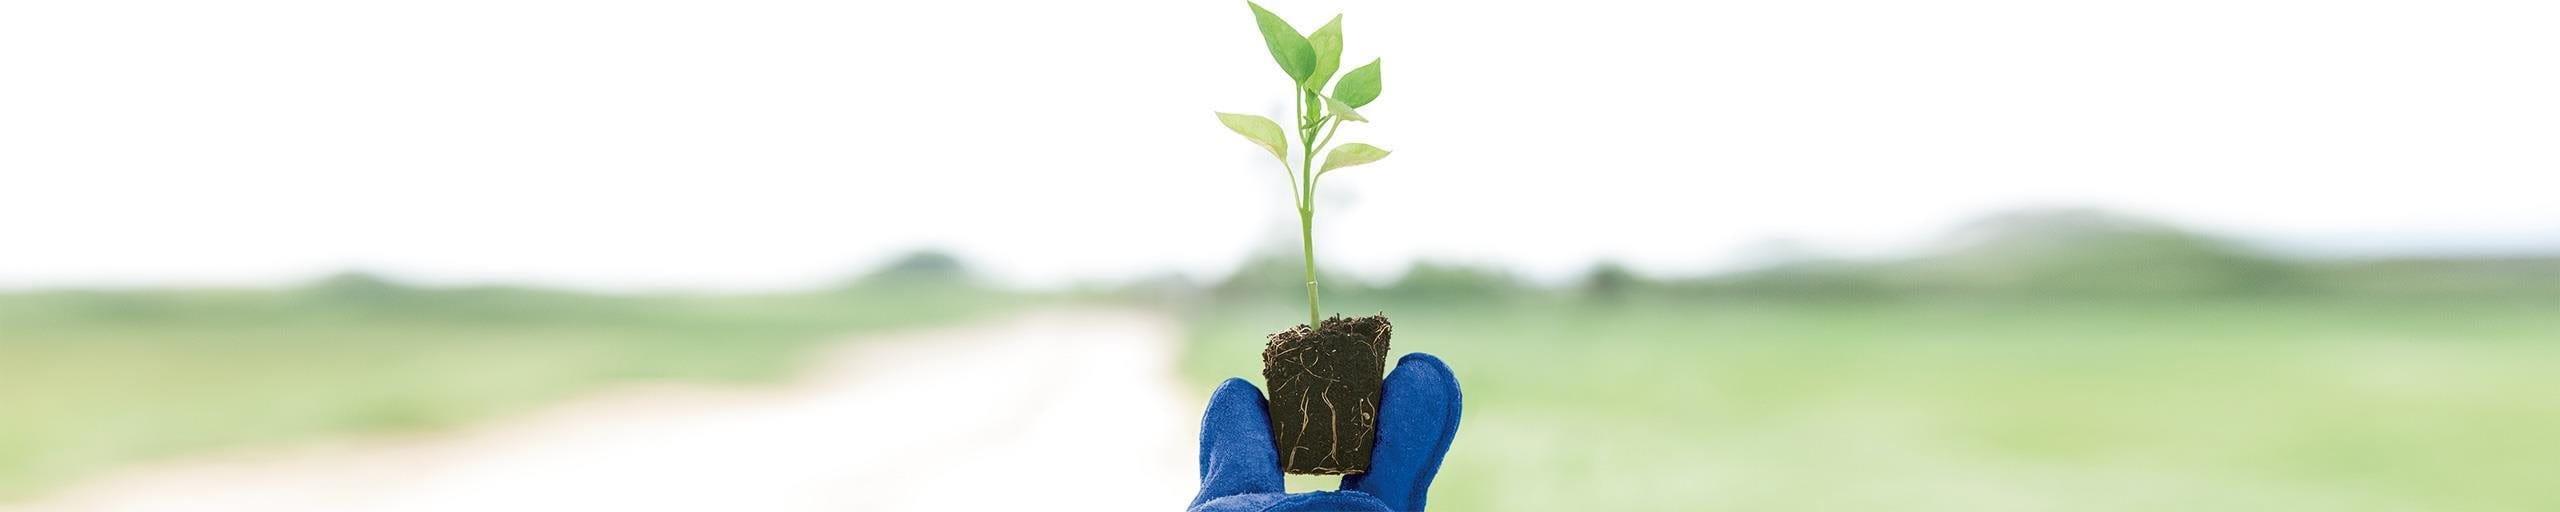 Junge Pflanze